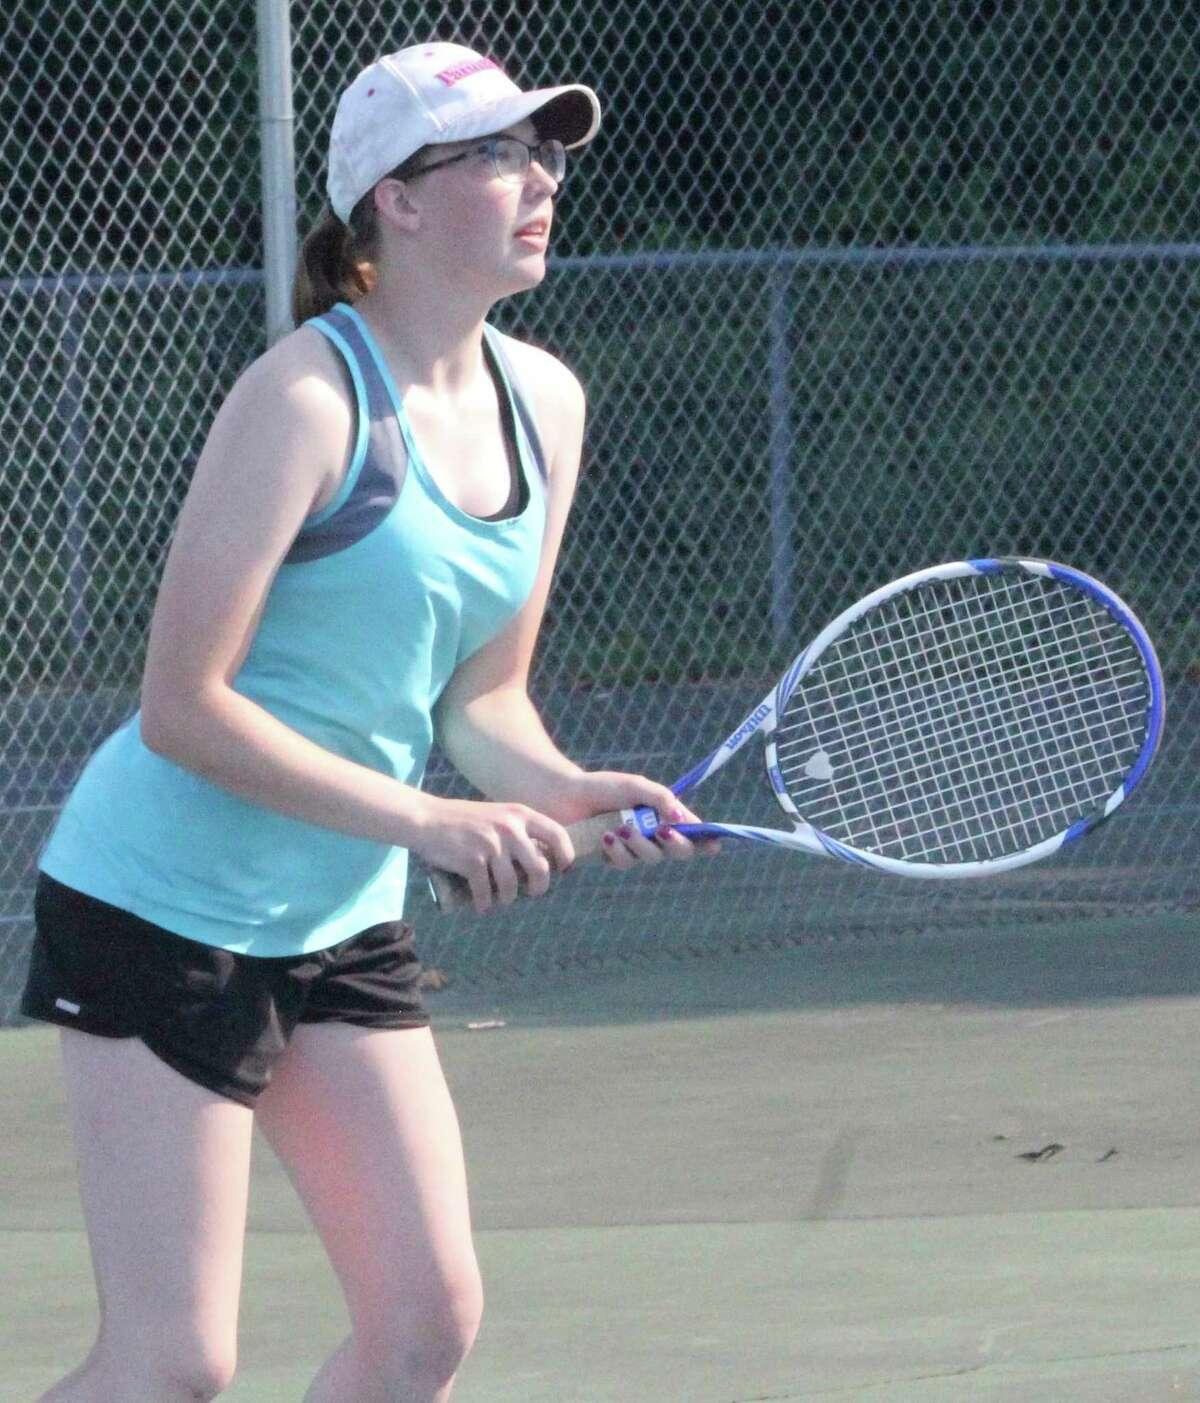 Karlie Hughes had a successful weekend for the Cardinal tennis team. (Pioneer file photo)